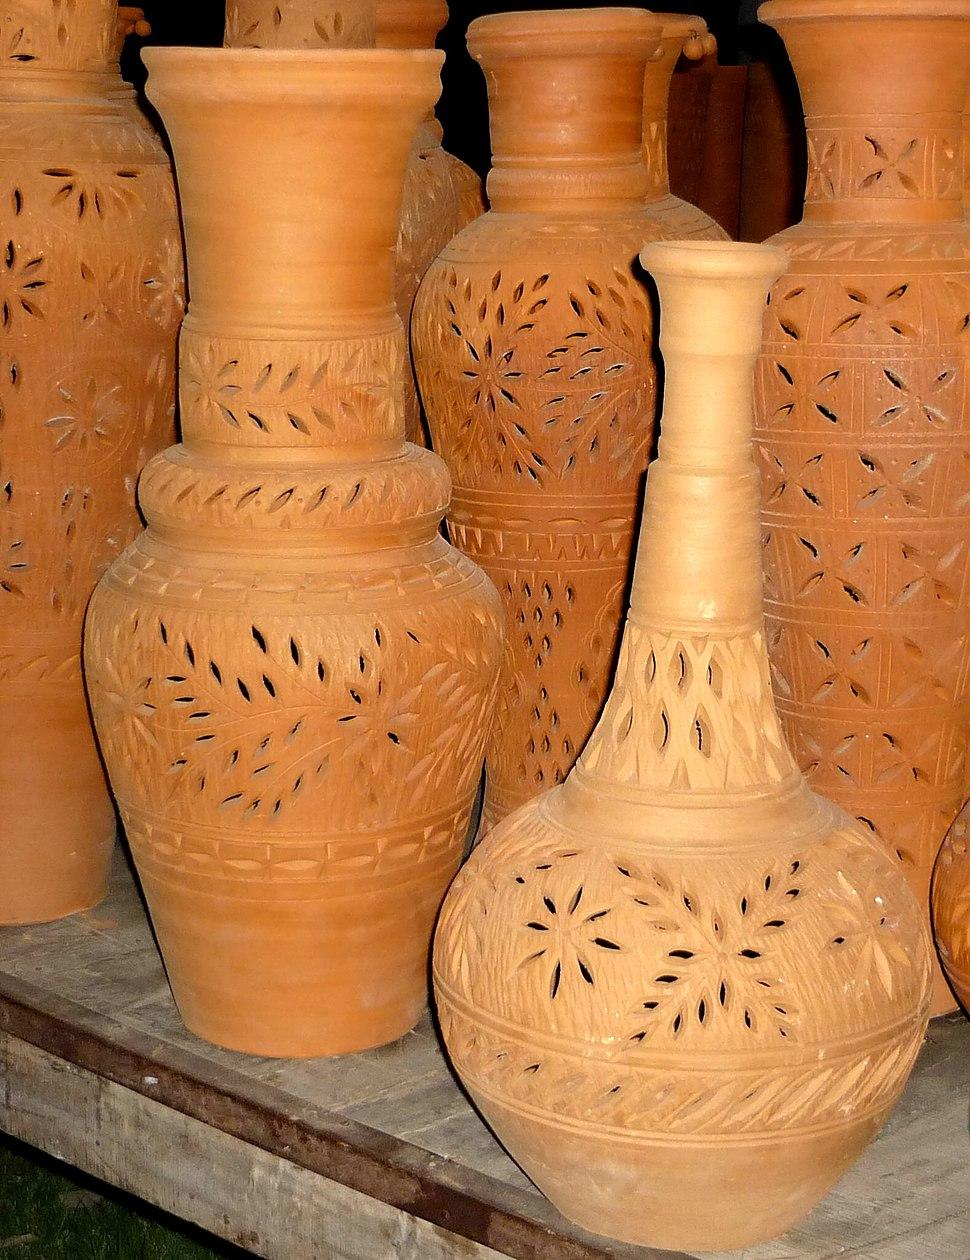 Clay pots in punjab pakistan-2